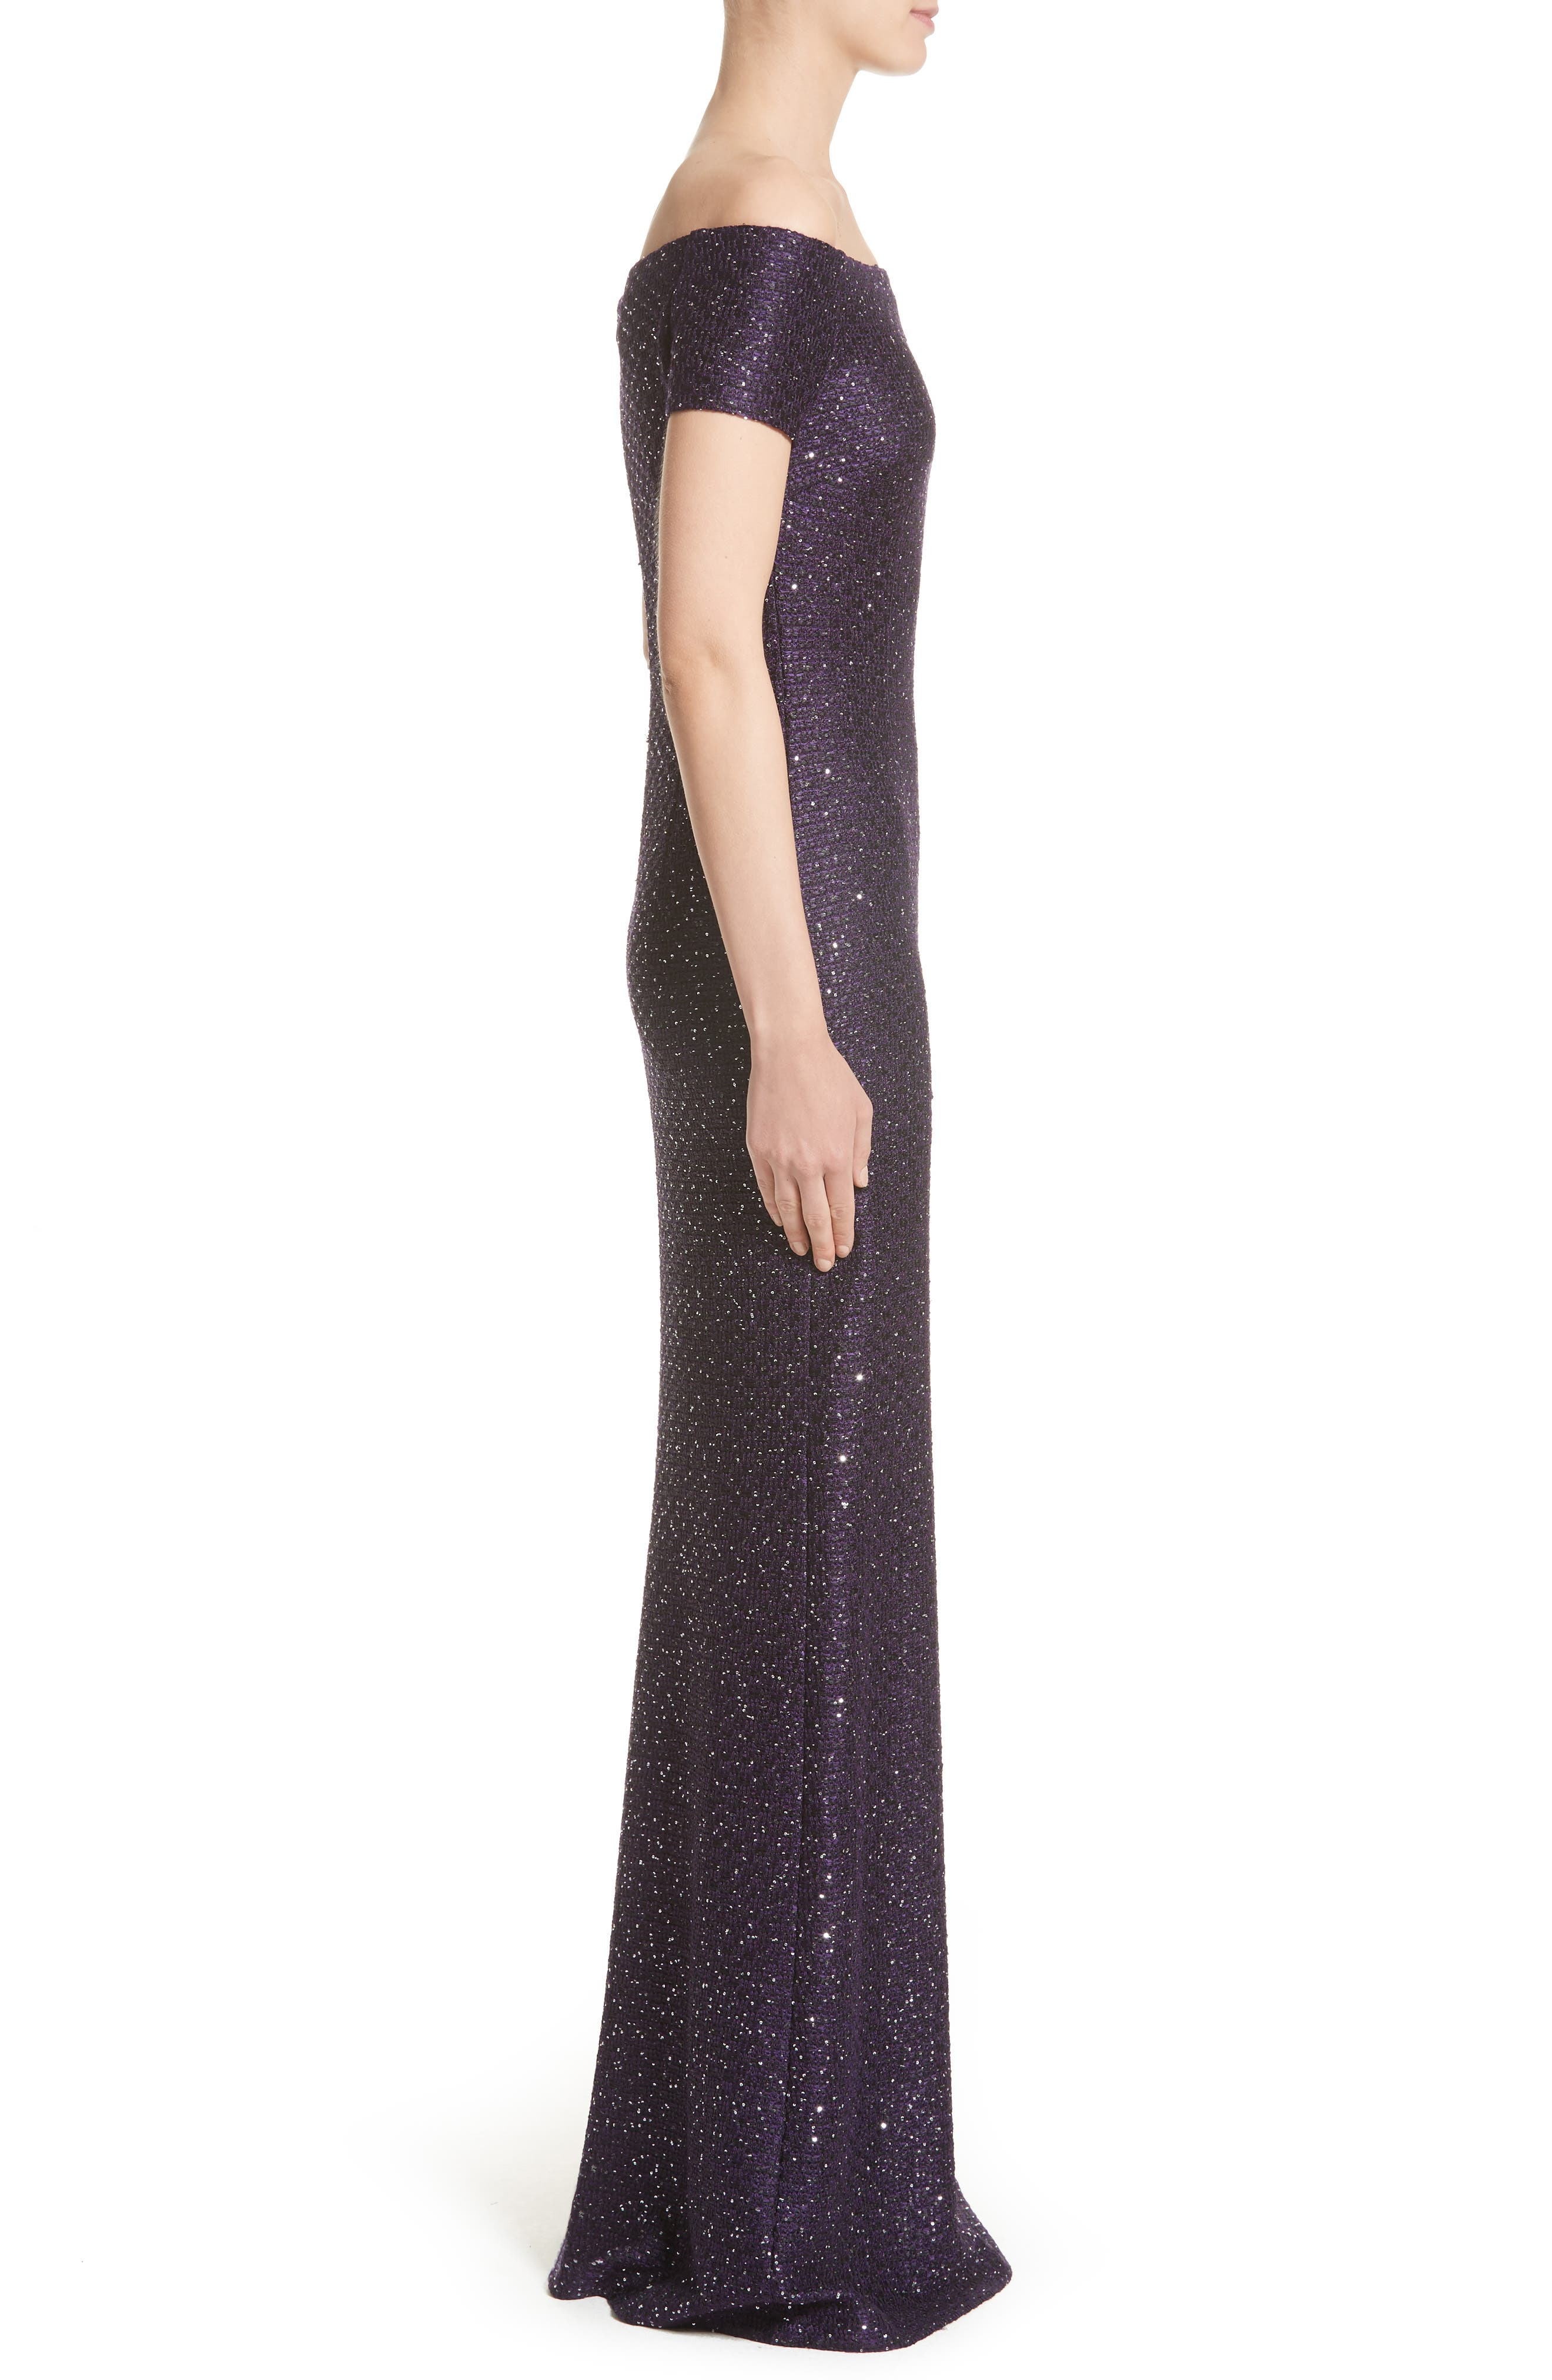 St John Evening Hansh Sequin Knit Off the Shoulder Gown,                             Alternate thumbnail 3, color,                             500